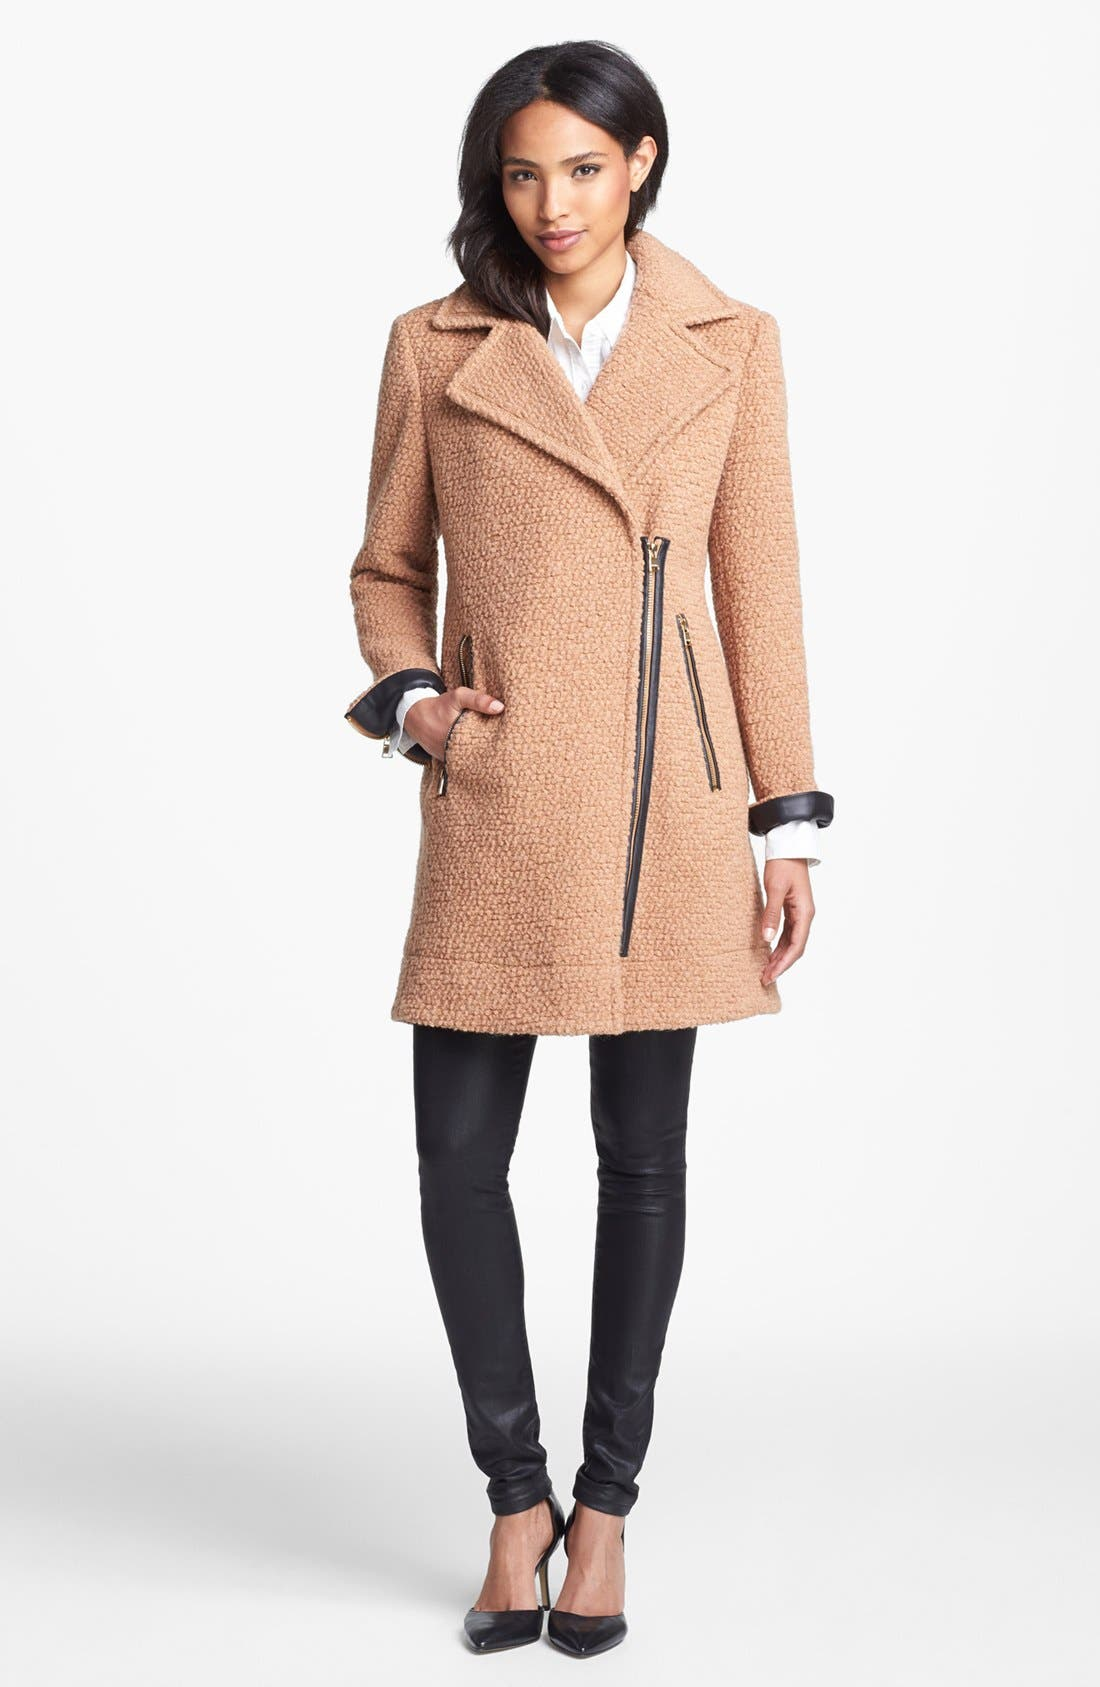 Alternate Image 1 Selected - Calvin Klein Asymmetrical Bouclé Jacket